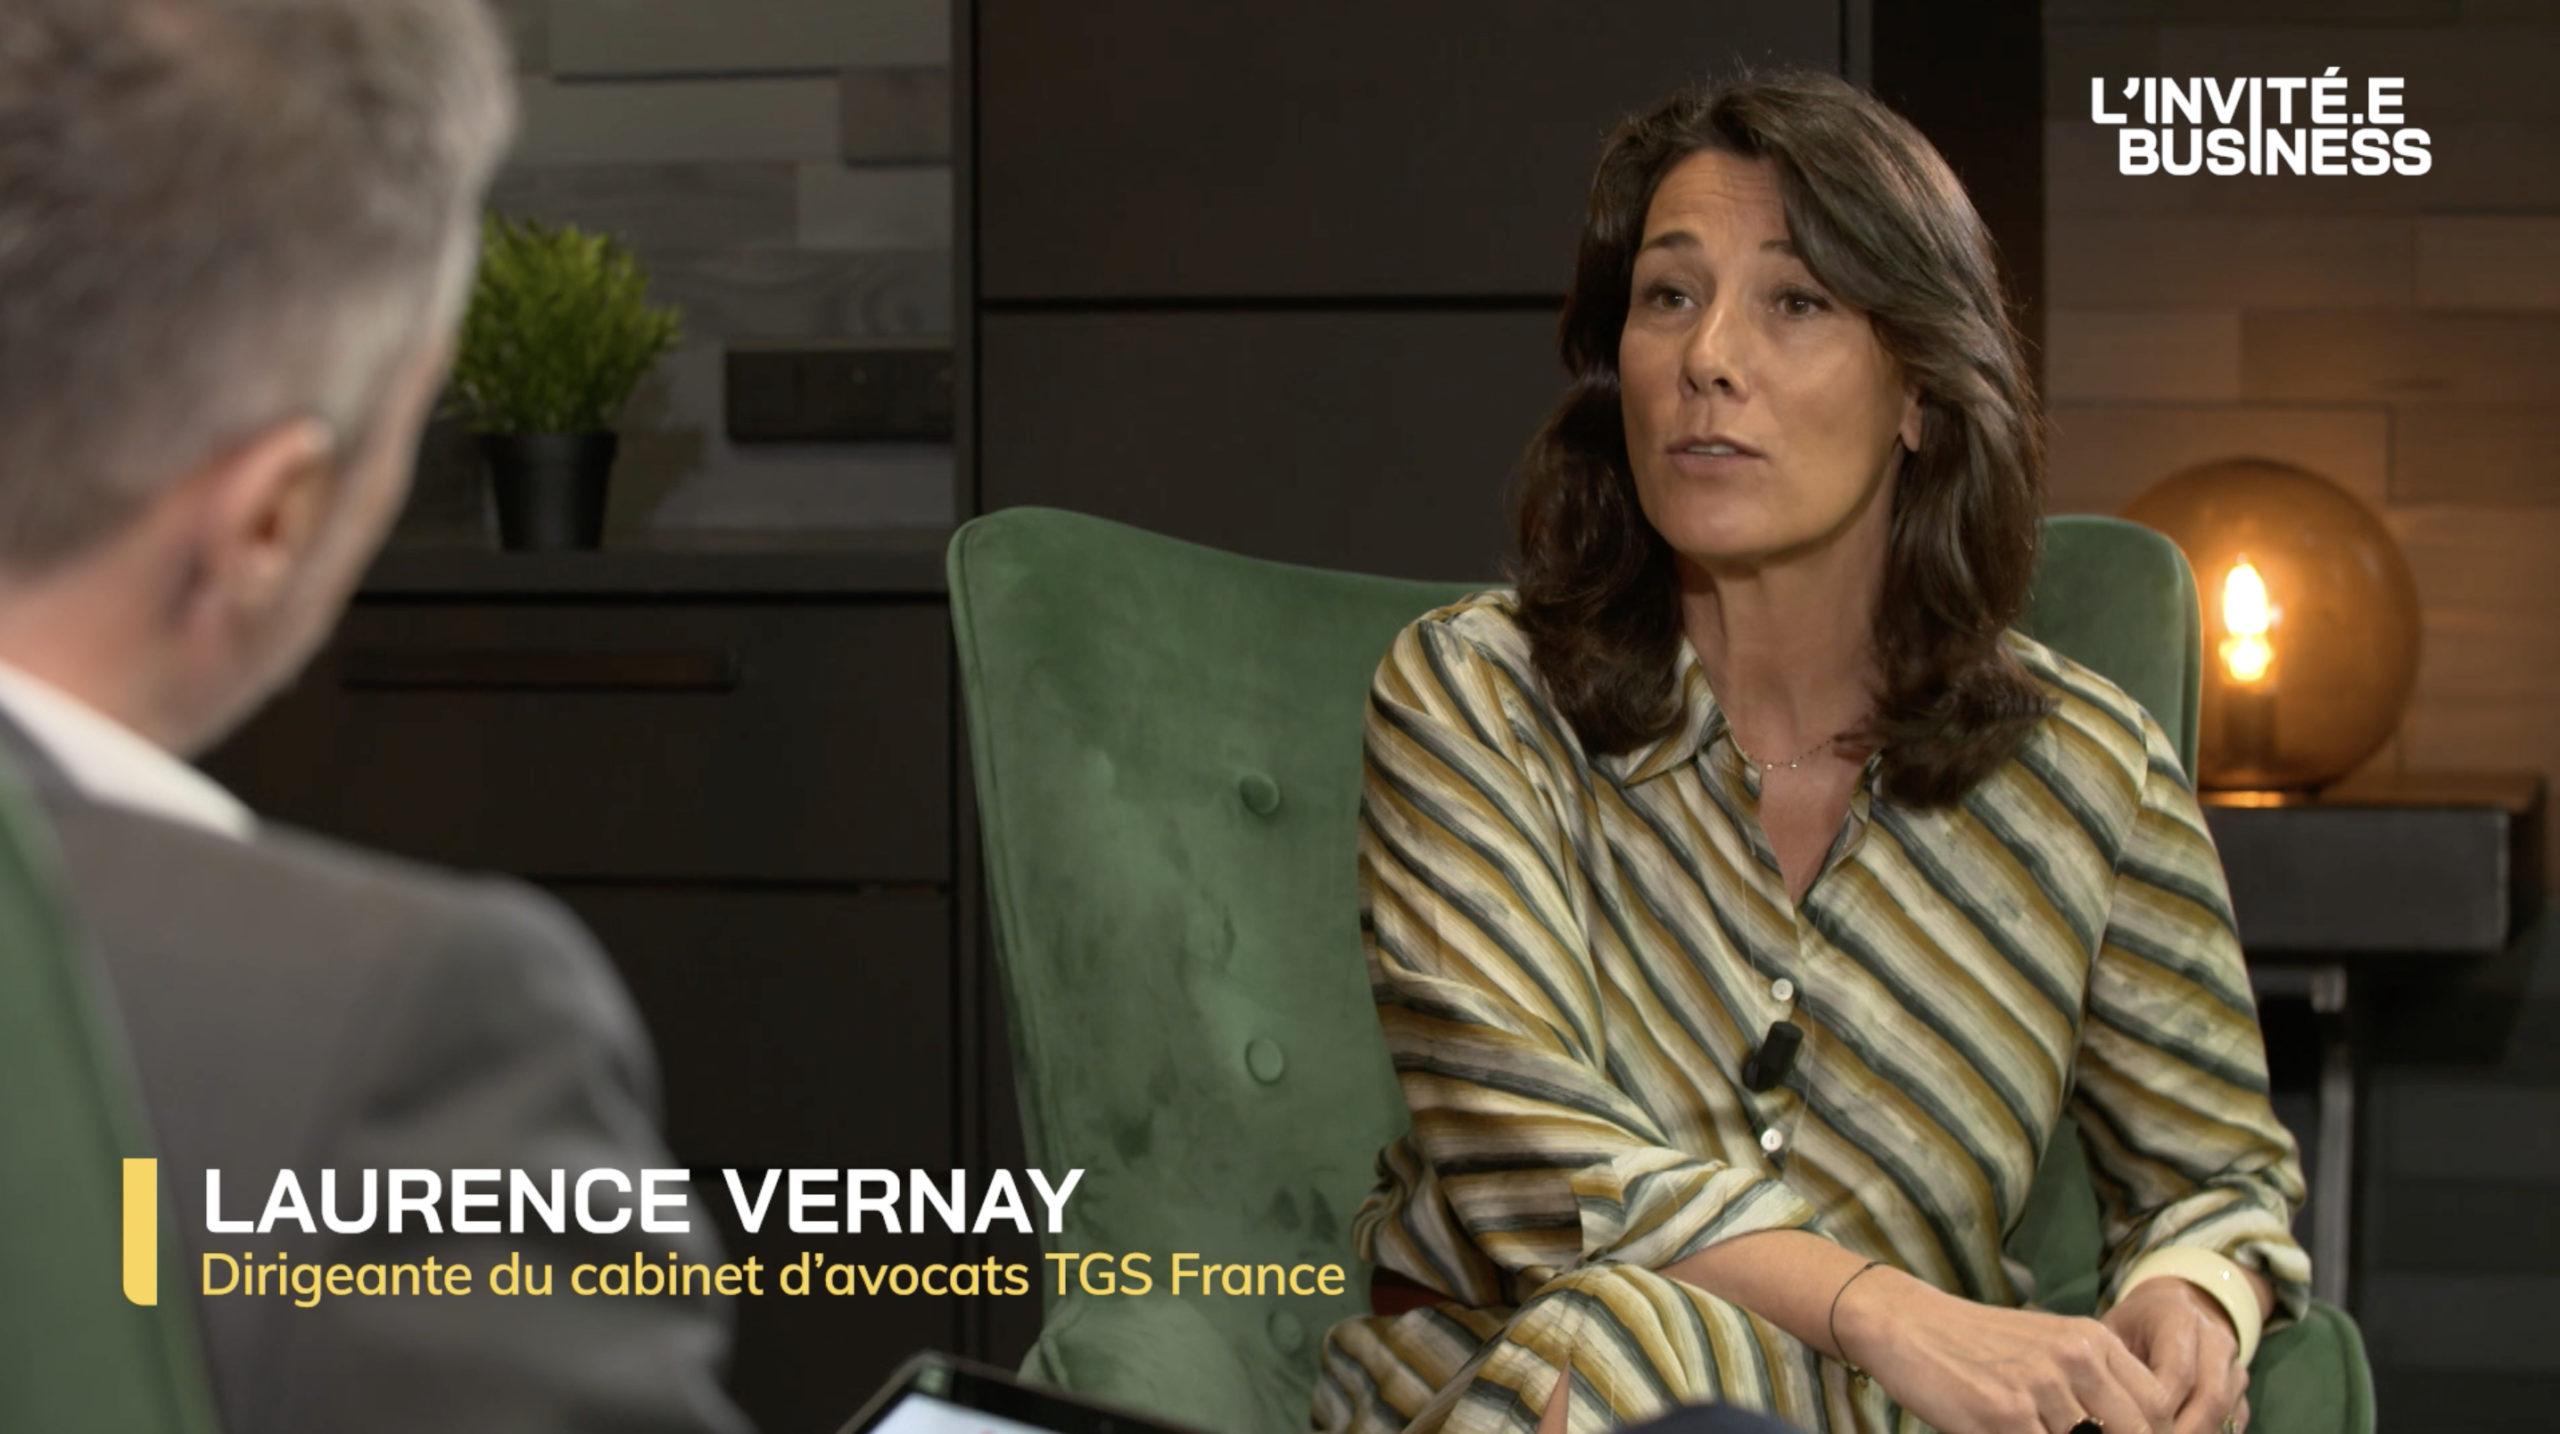 Laurence Vernay, Dirigeante du cabinet d'avocats TGS France